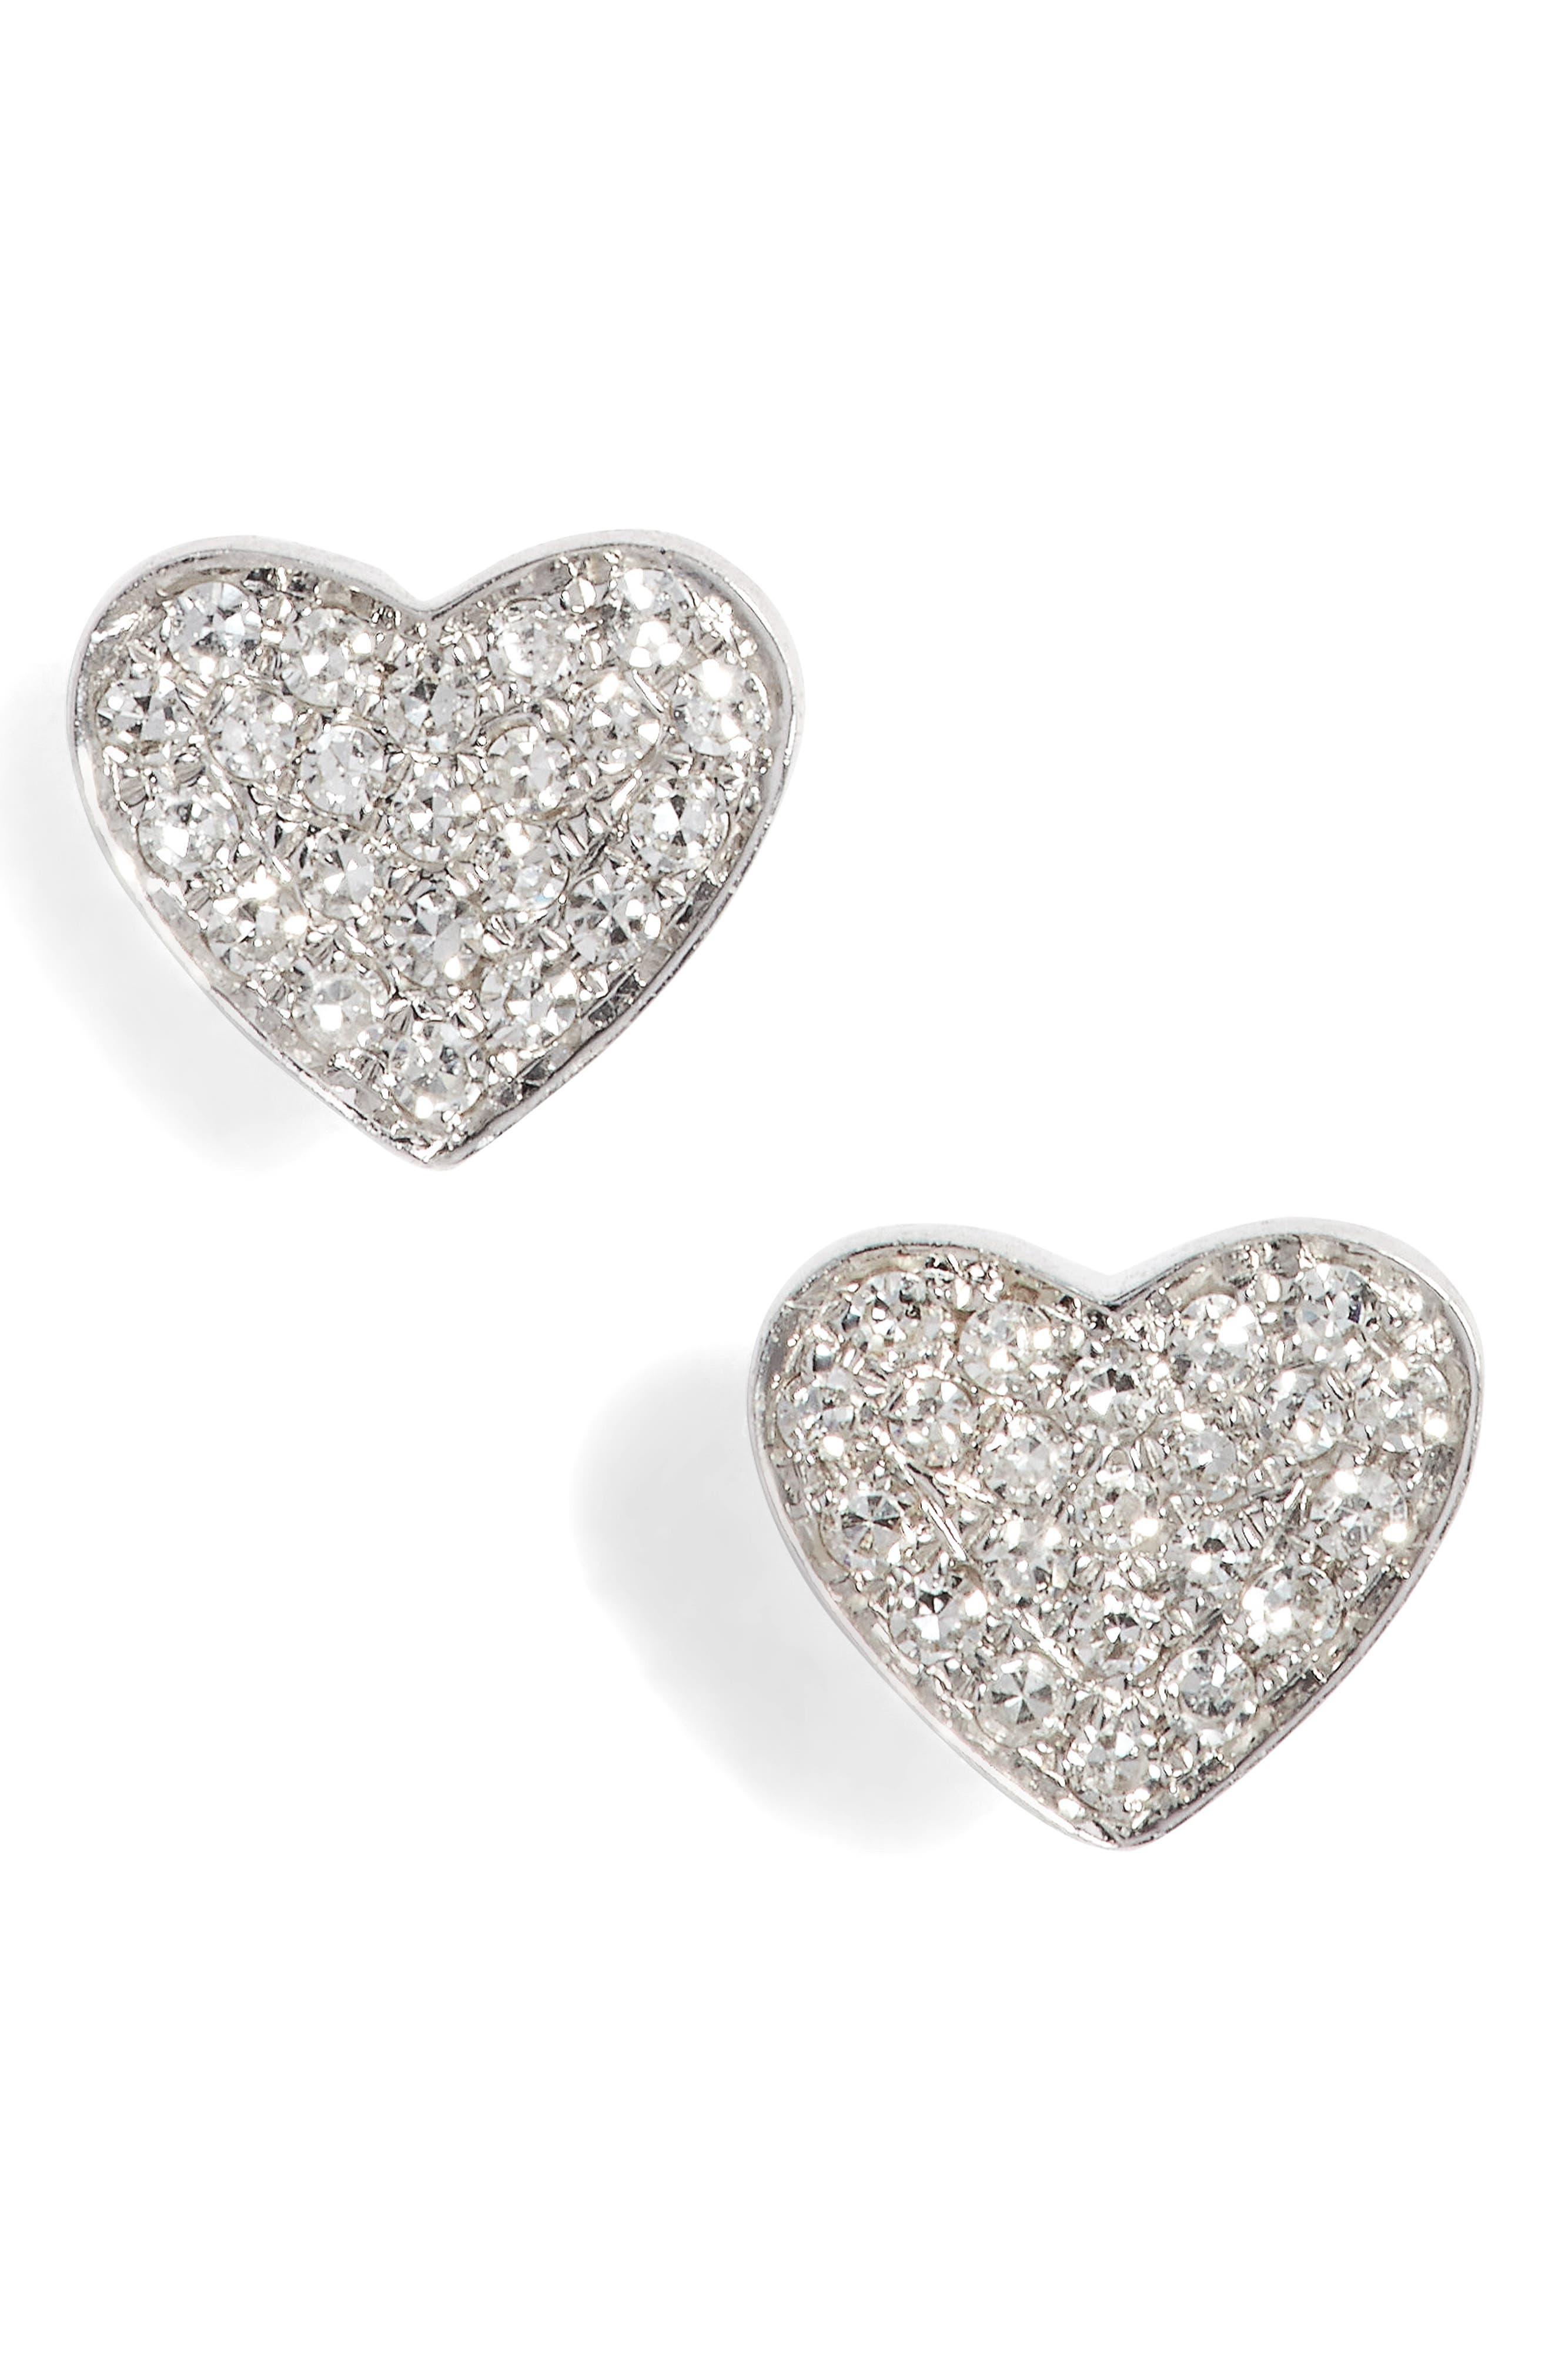 Diamond Heart Stud Earrings,                             Main thumbnail 1, color,                             WHITE GOLD